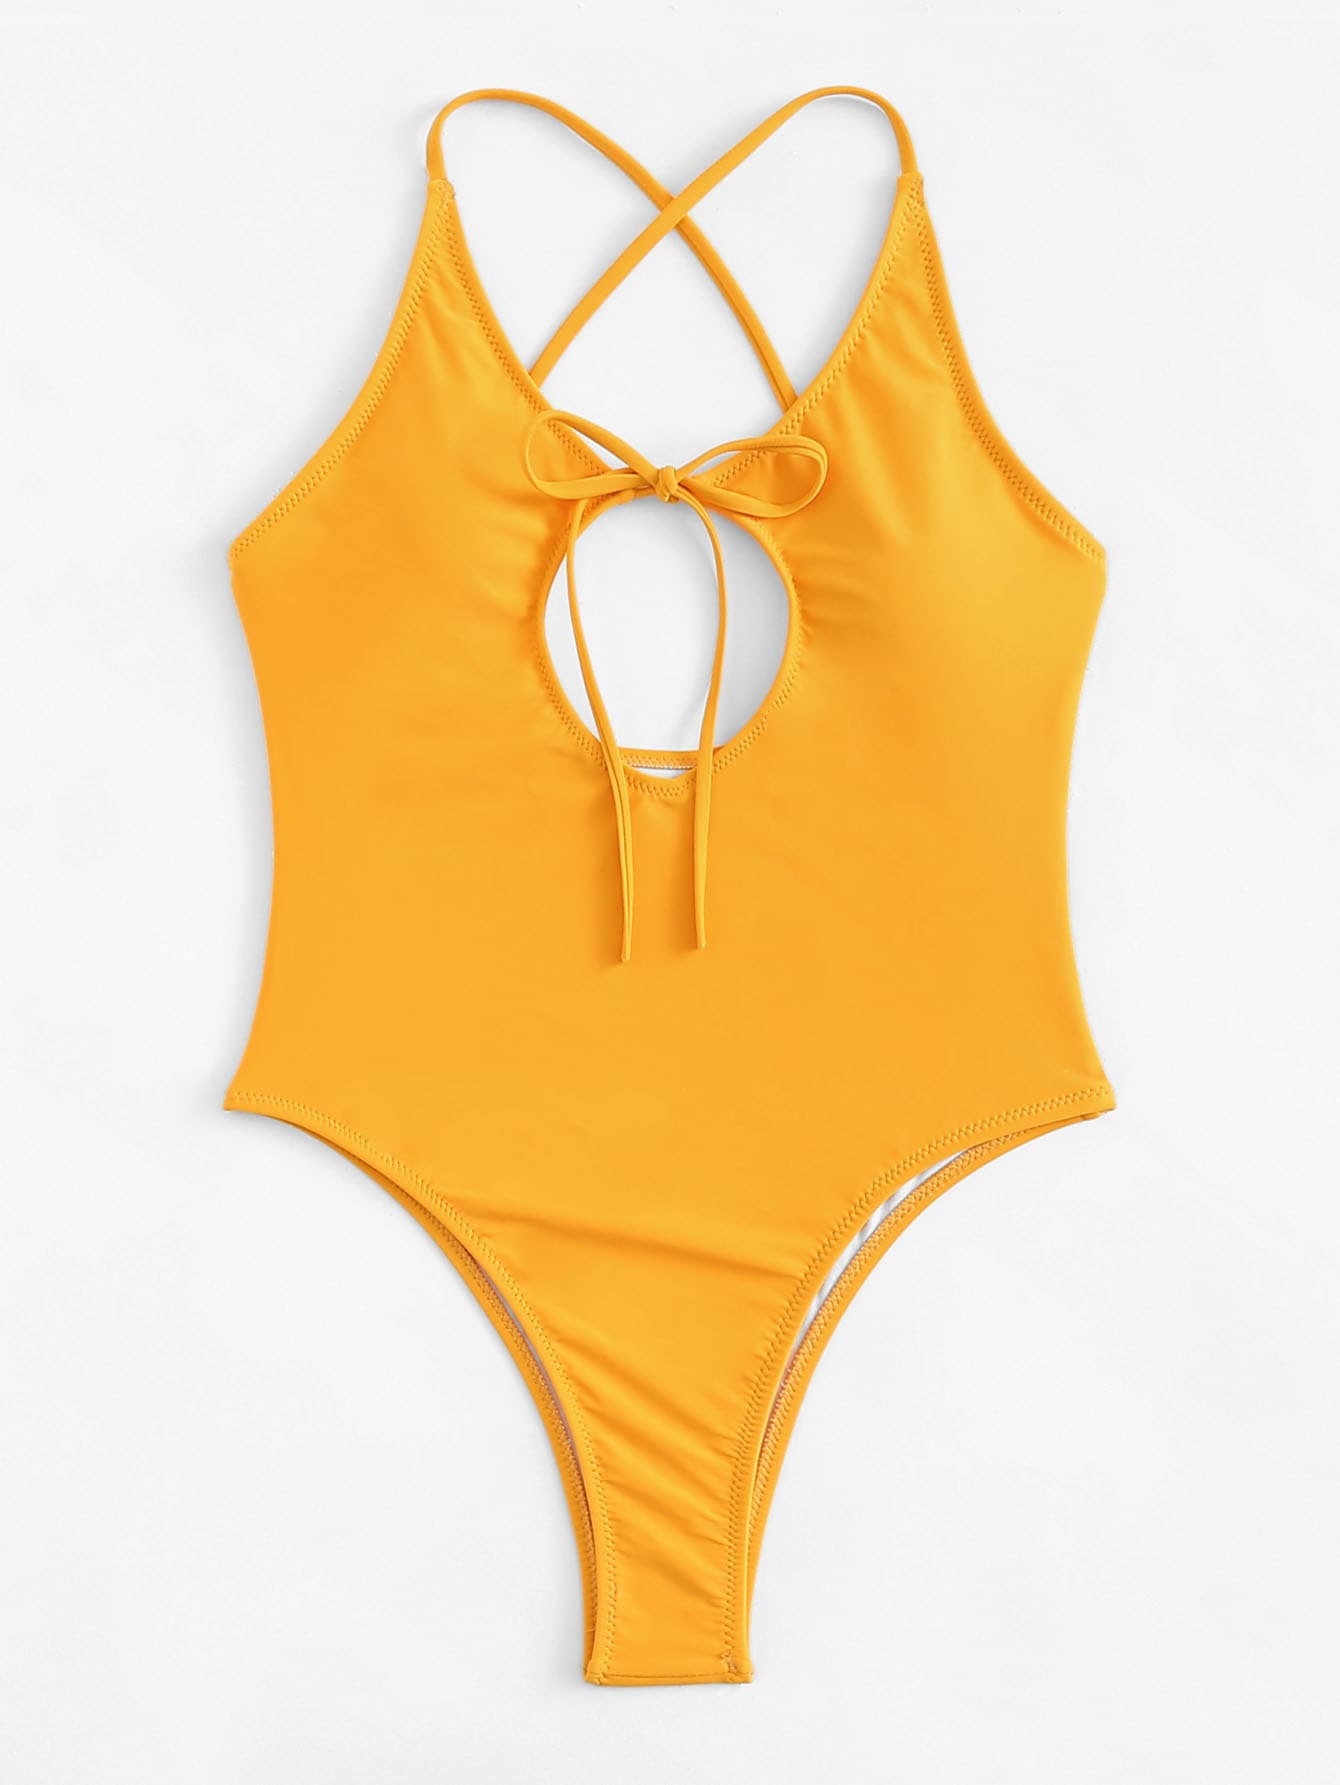 Купить Cut-Out Criss Cross Swimsuit, null, SheIn